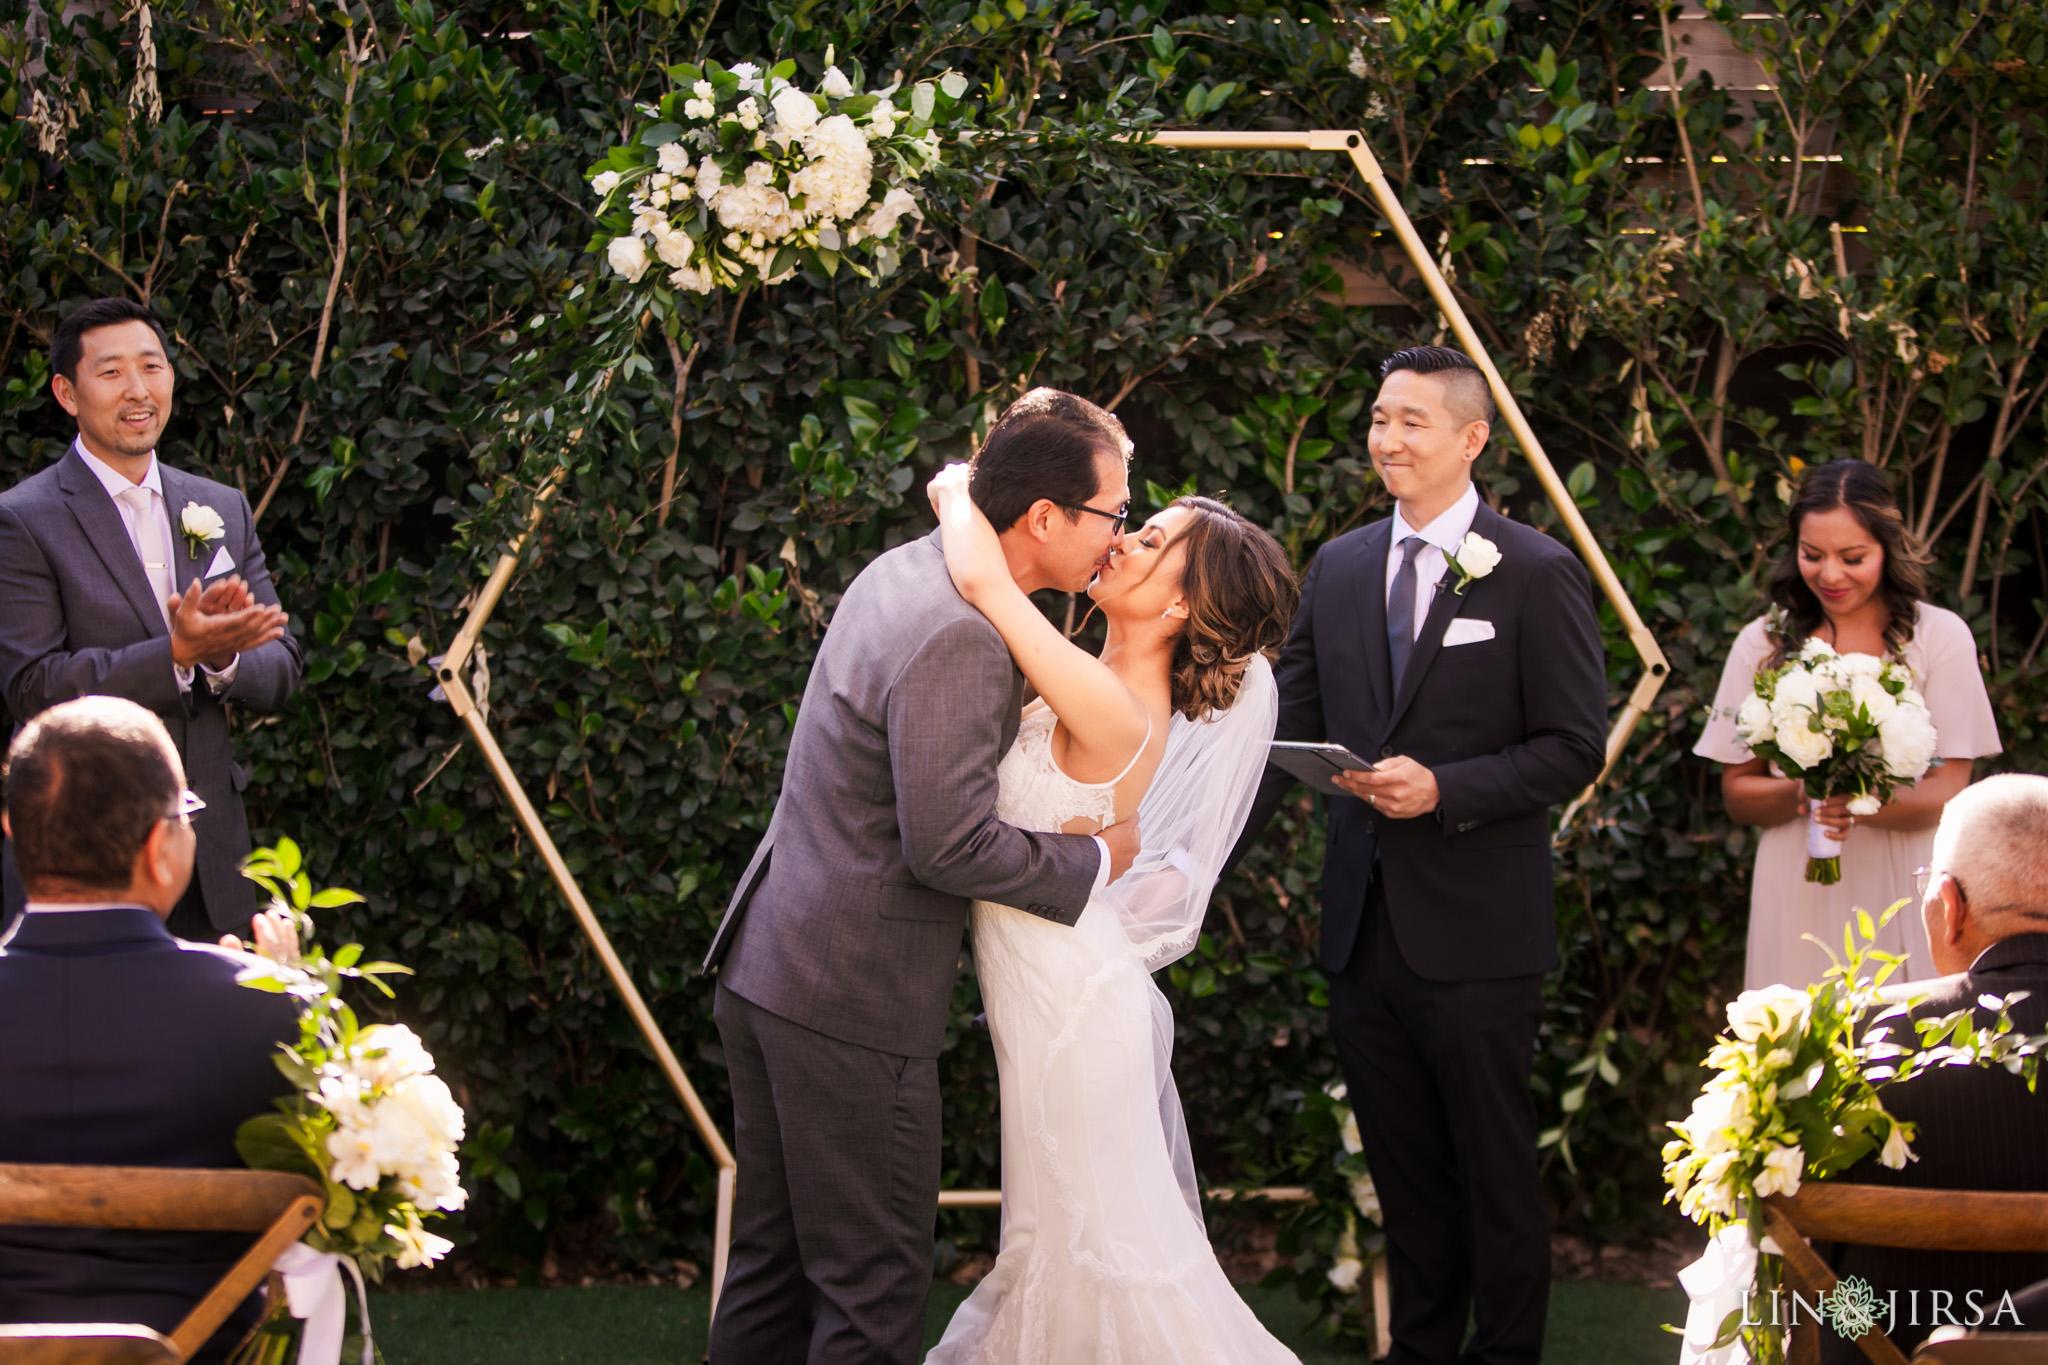 022 york manor los angeles wedding ceremony photography